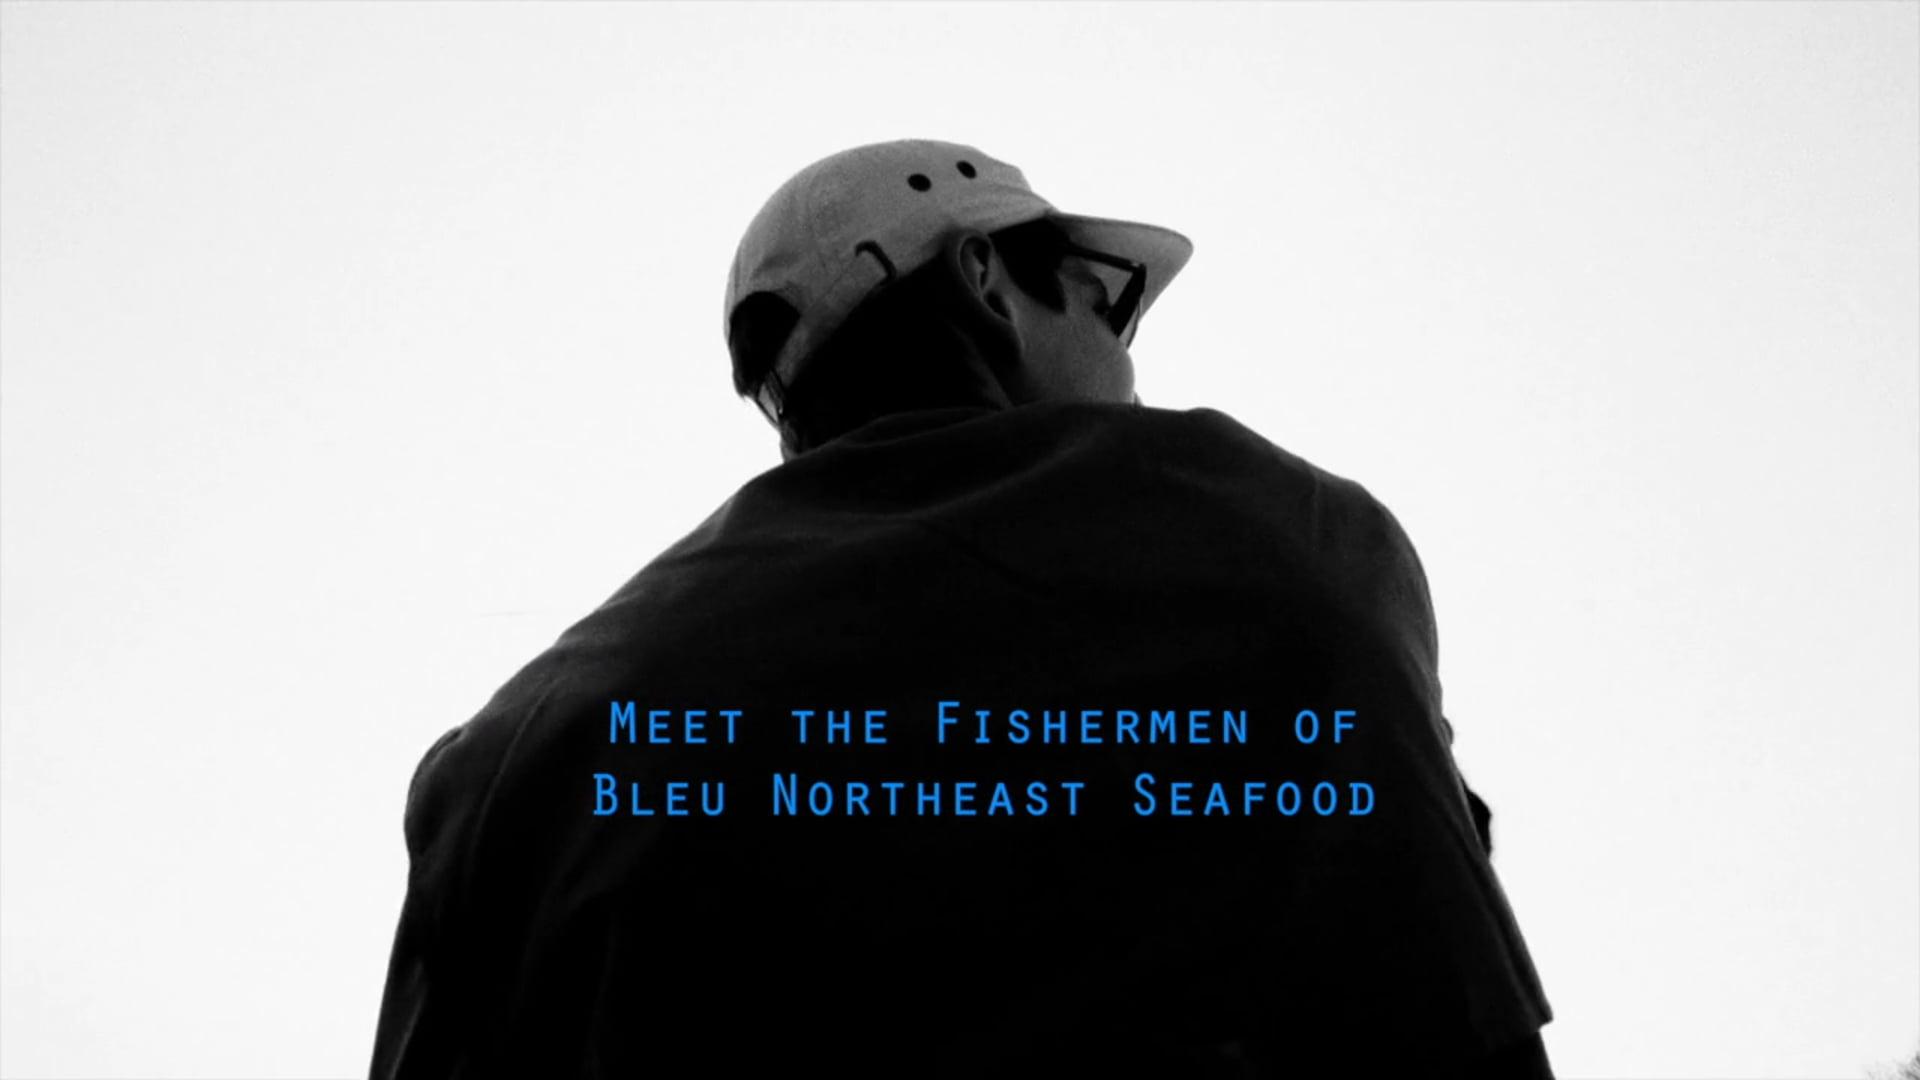 Bleu Northeast Seafood